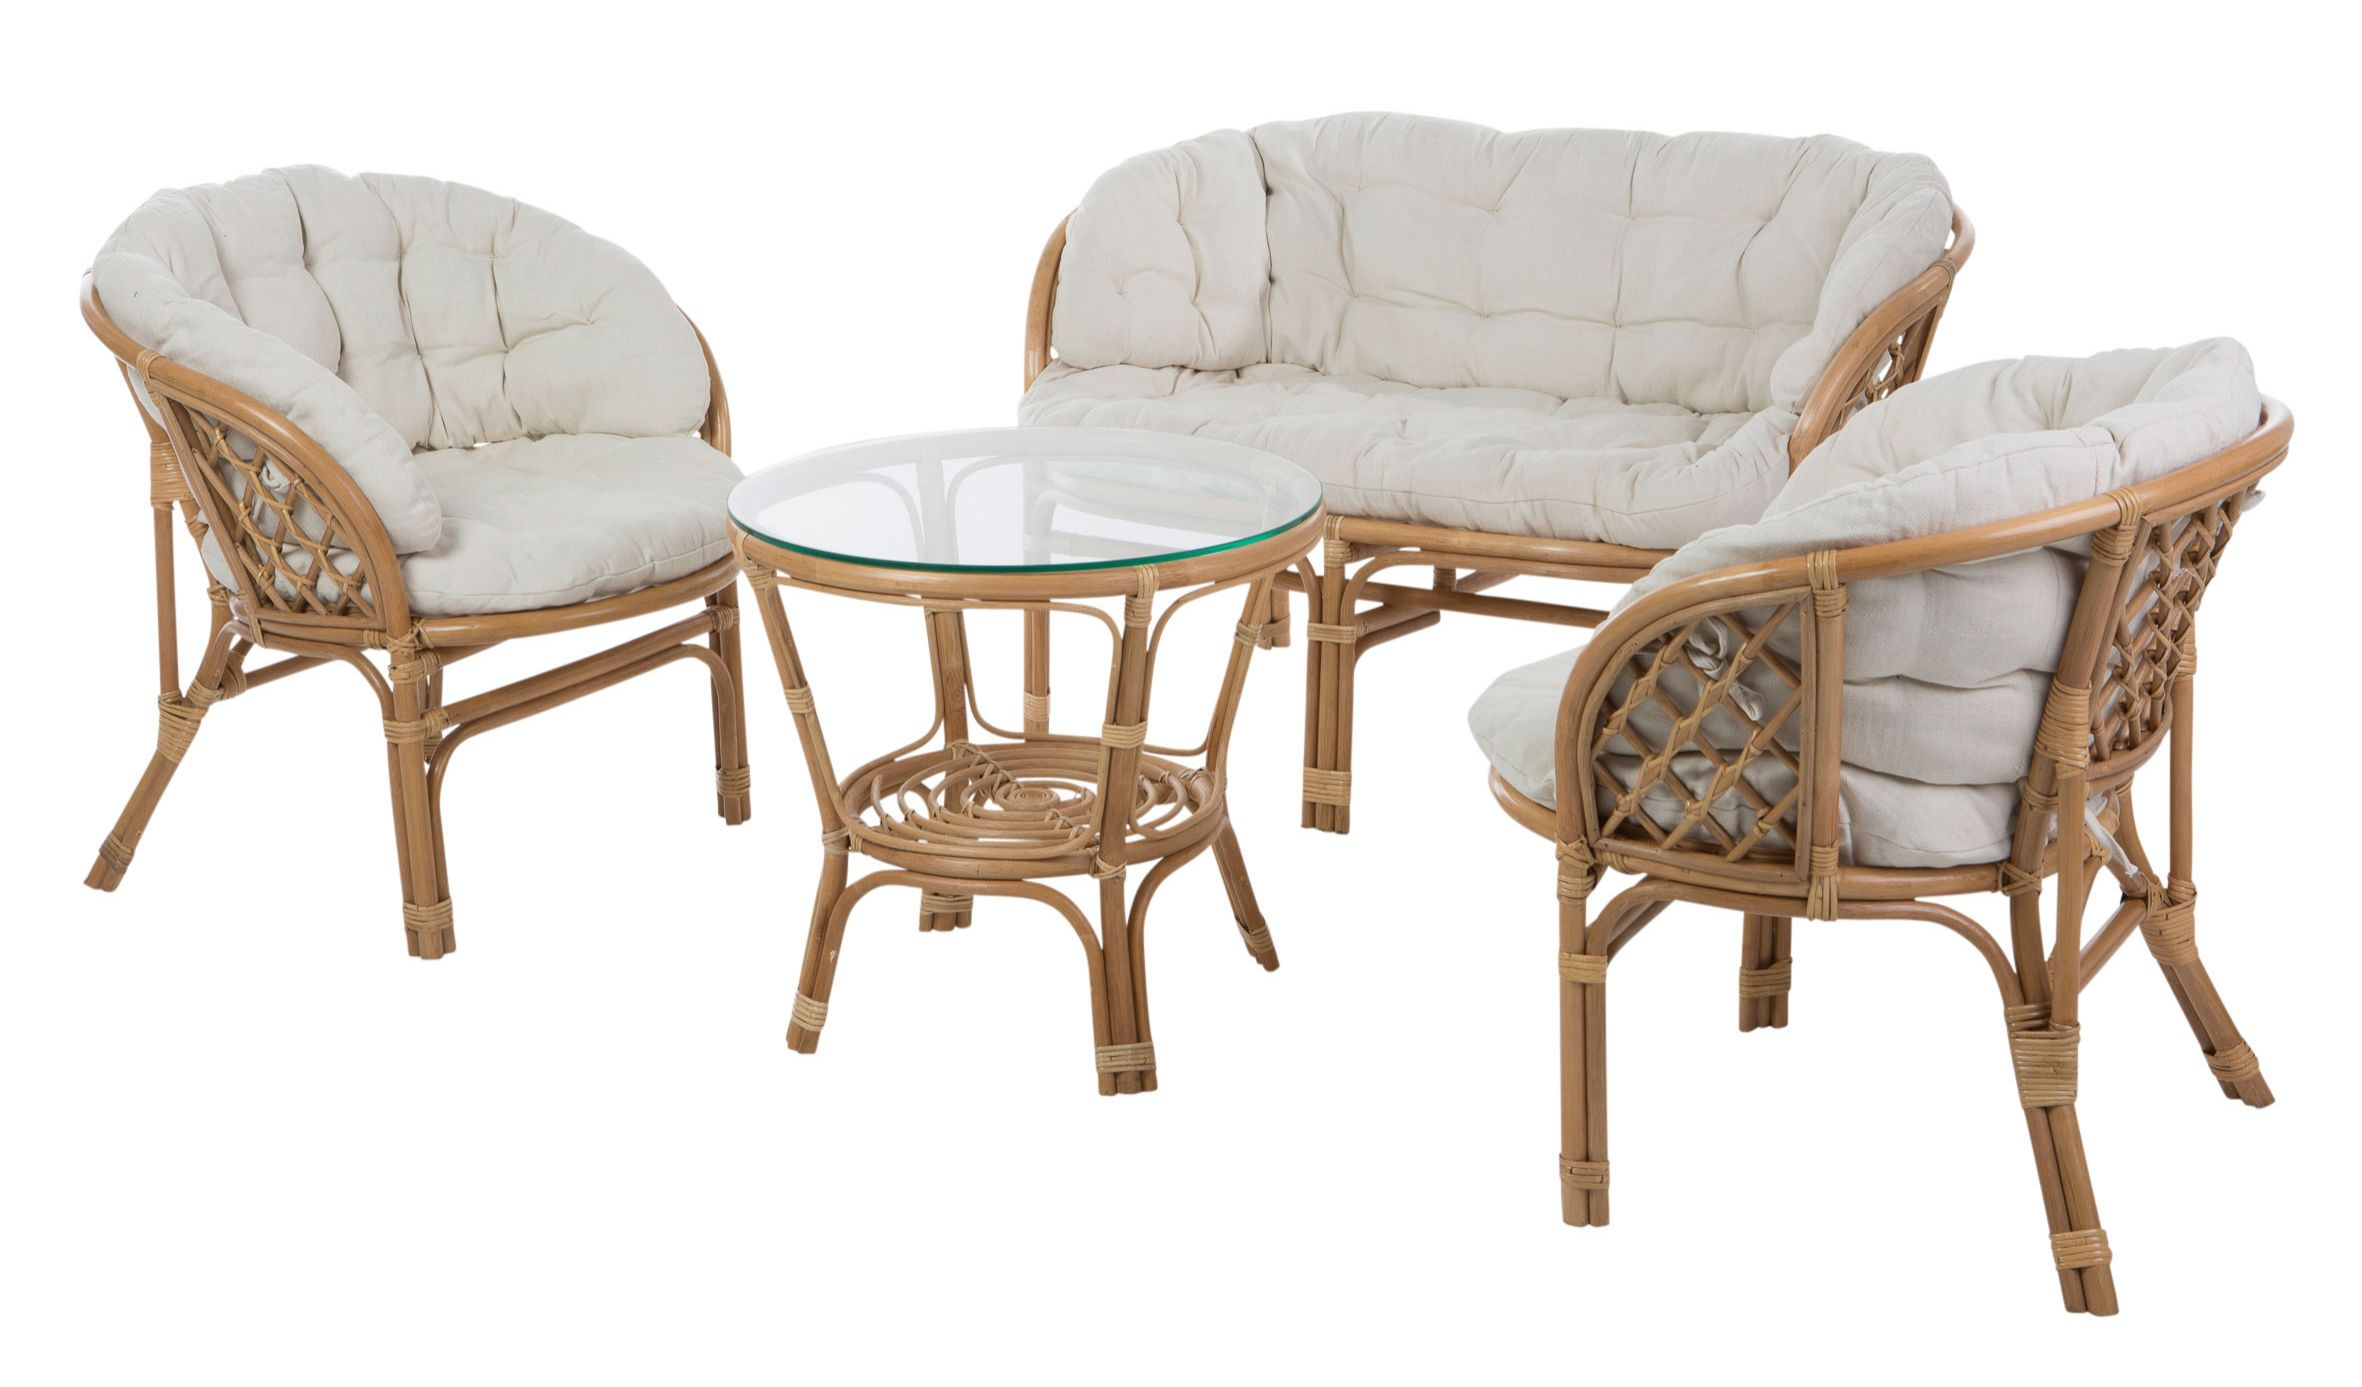 Manou meubelen set